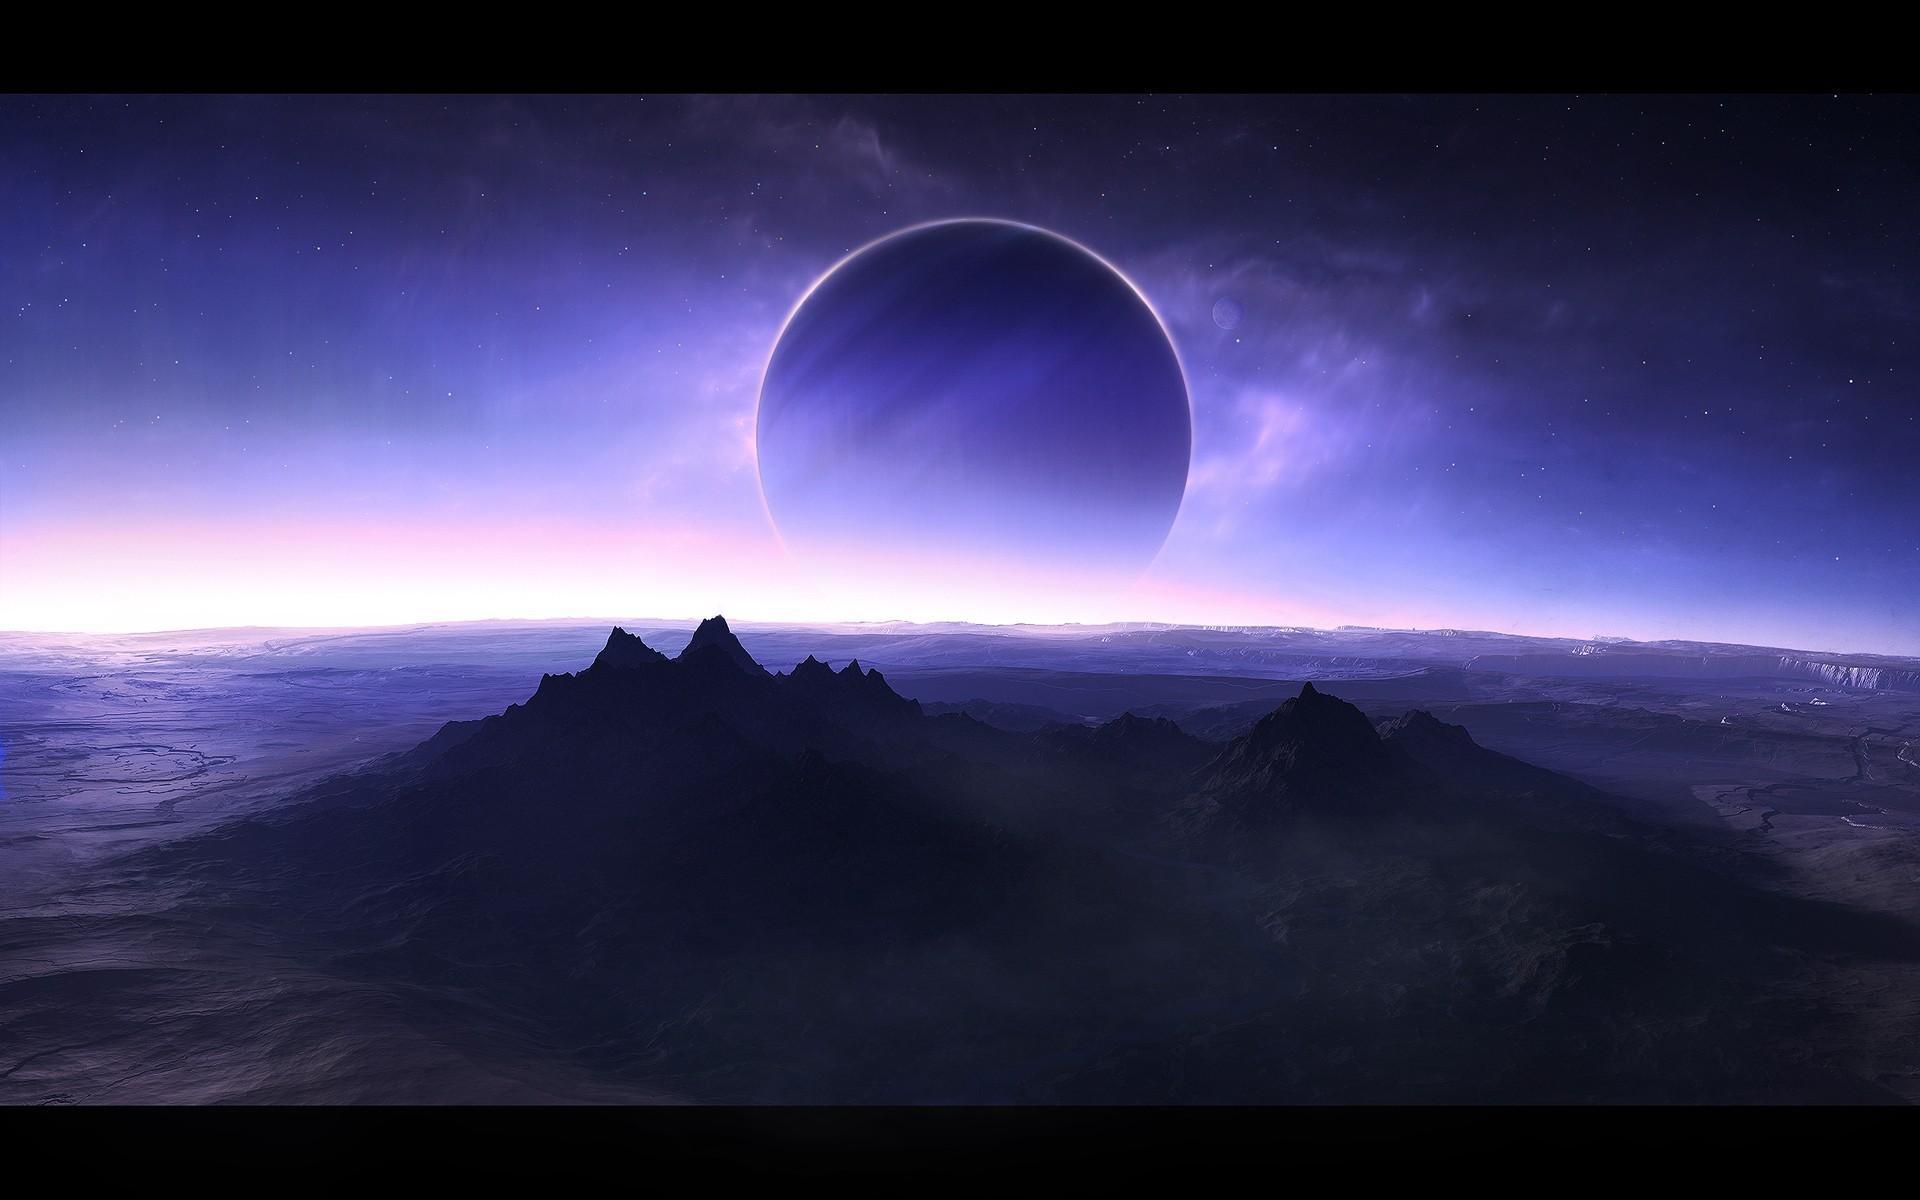 Fantasy Planet Blue planet HD Wallpapers Desktop 1920x1200